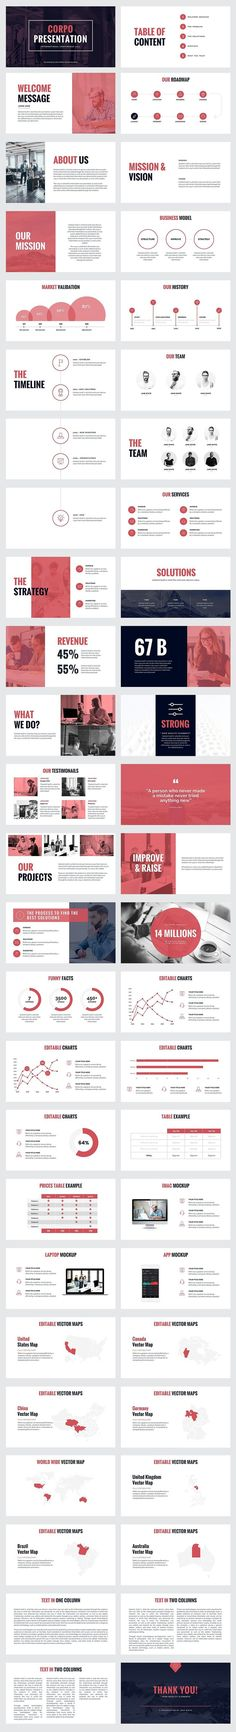 62 Best Powerpoint images in 2018 | Ppt design, Presentation